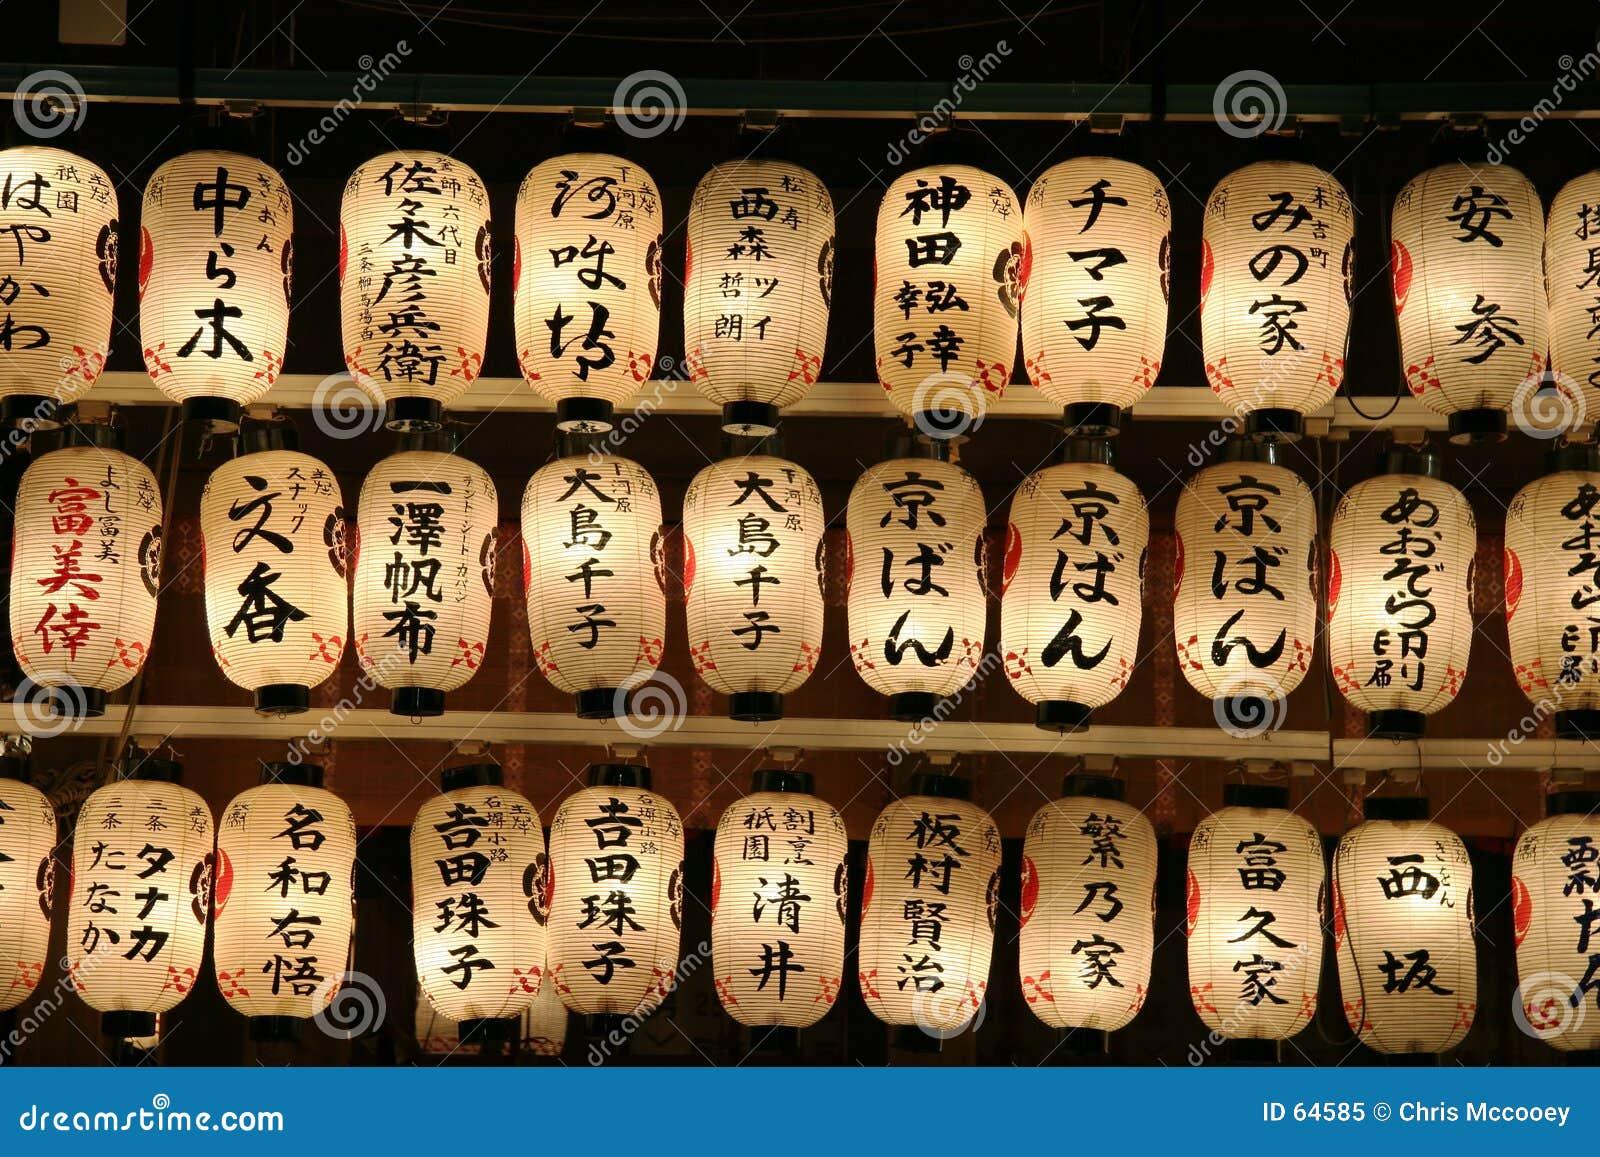 Download Covered Japanese Kanji Lanterns Στοκ Εικόνα - εικόνα από ασιατικοί, έγγραφο: 64585